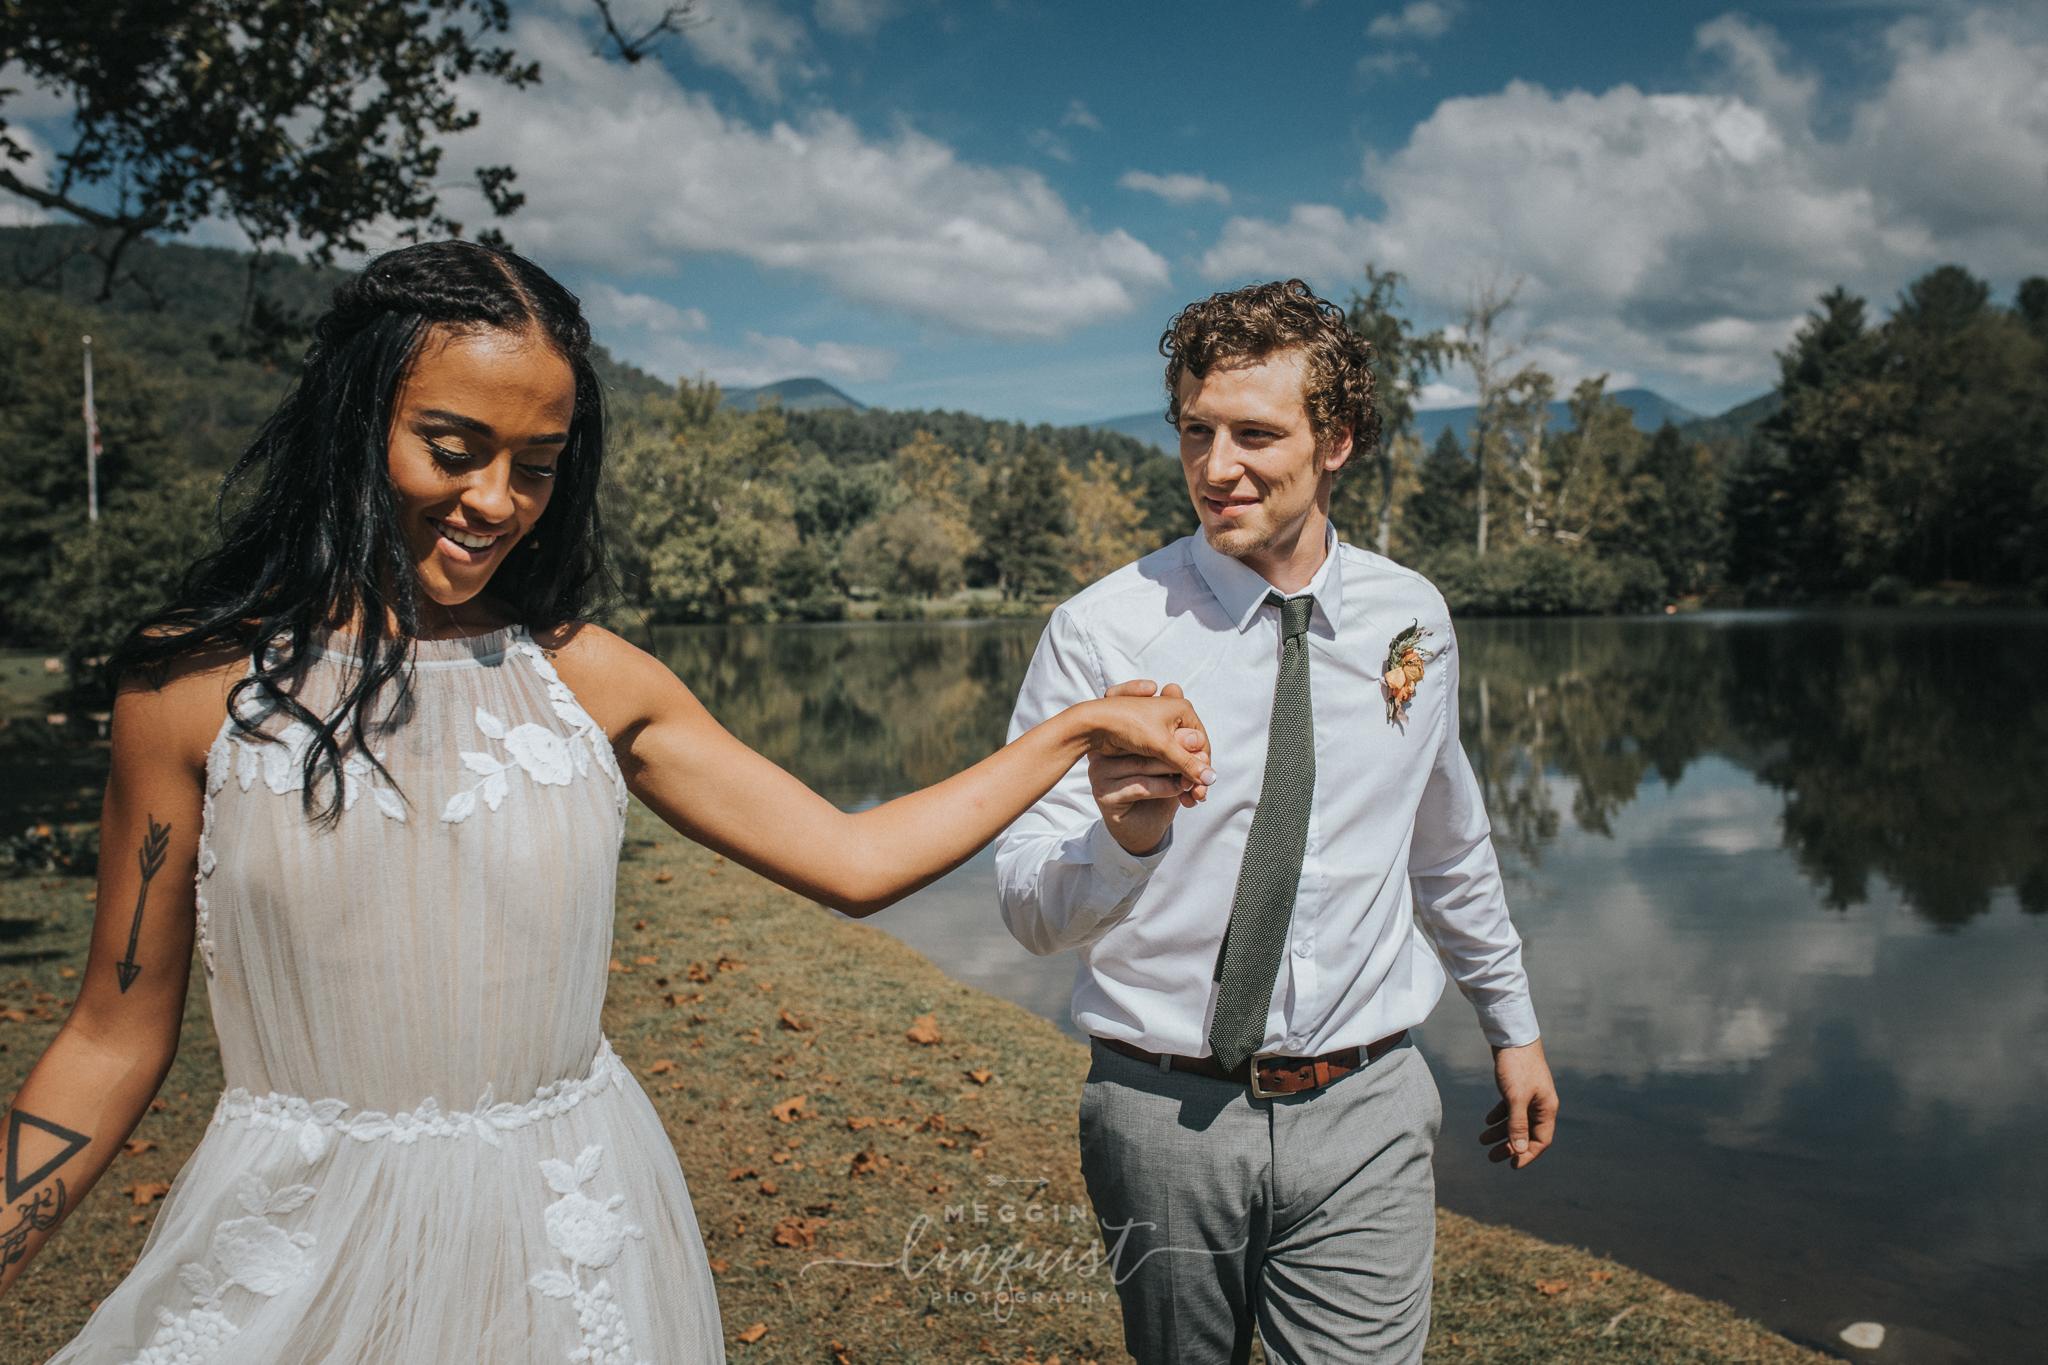 vintage-themed-wedding-reno-lake-tahoe-wedding-photographer-44.jpg